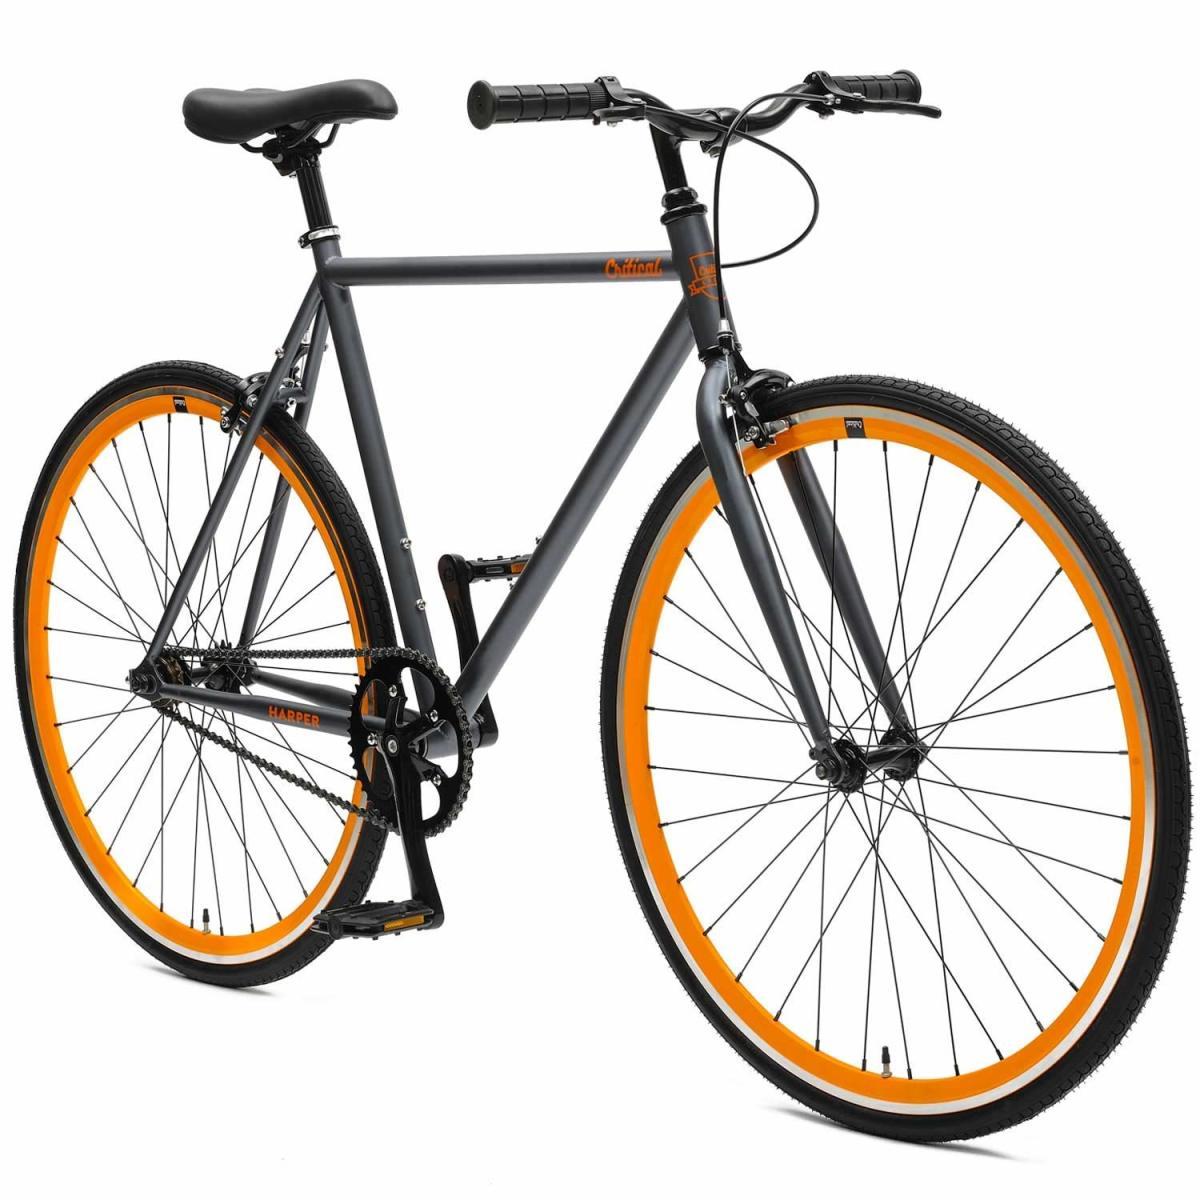 five-best-cheap-fixie-bikes-under-300